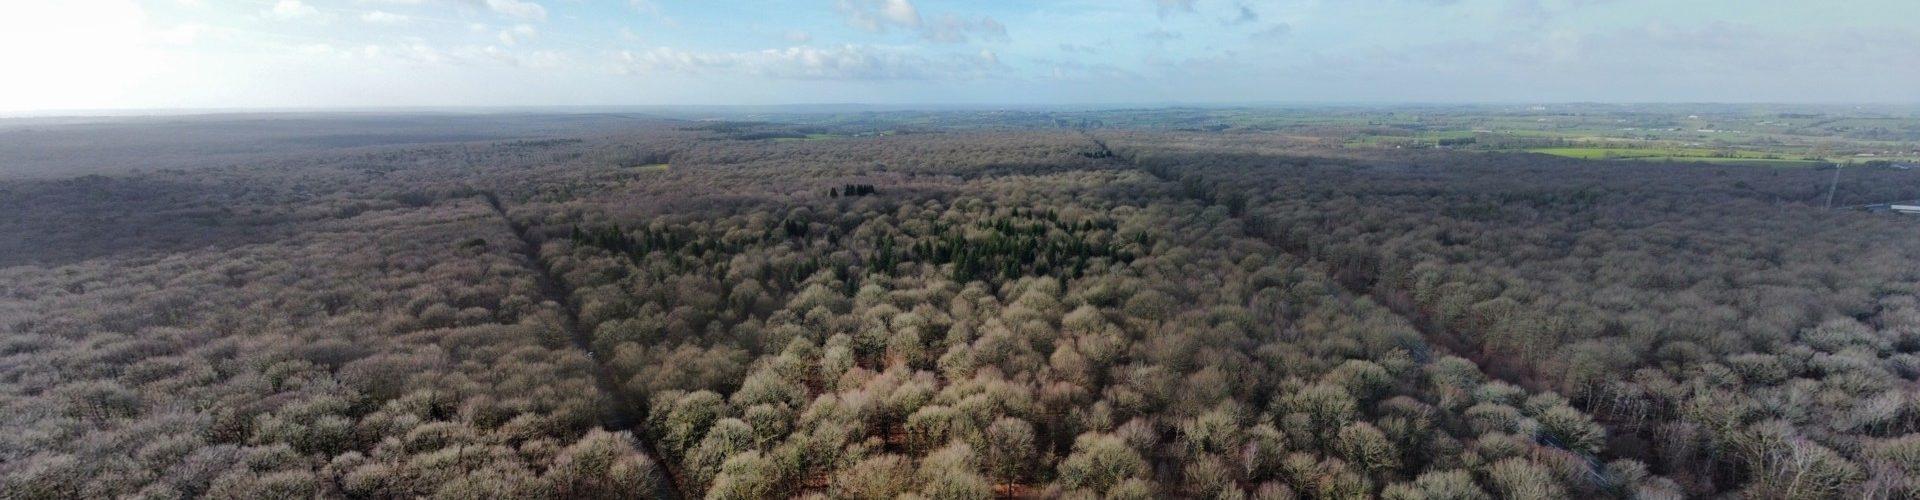 Forêt de Mayenne2